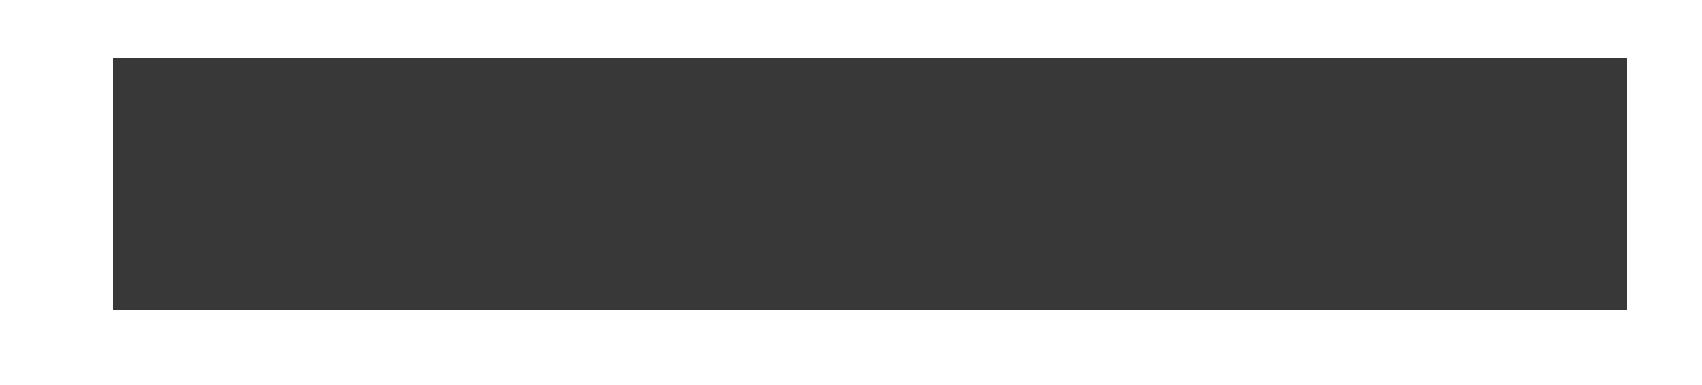 lets-connect.png